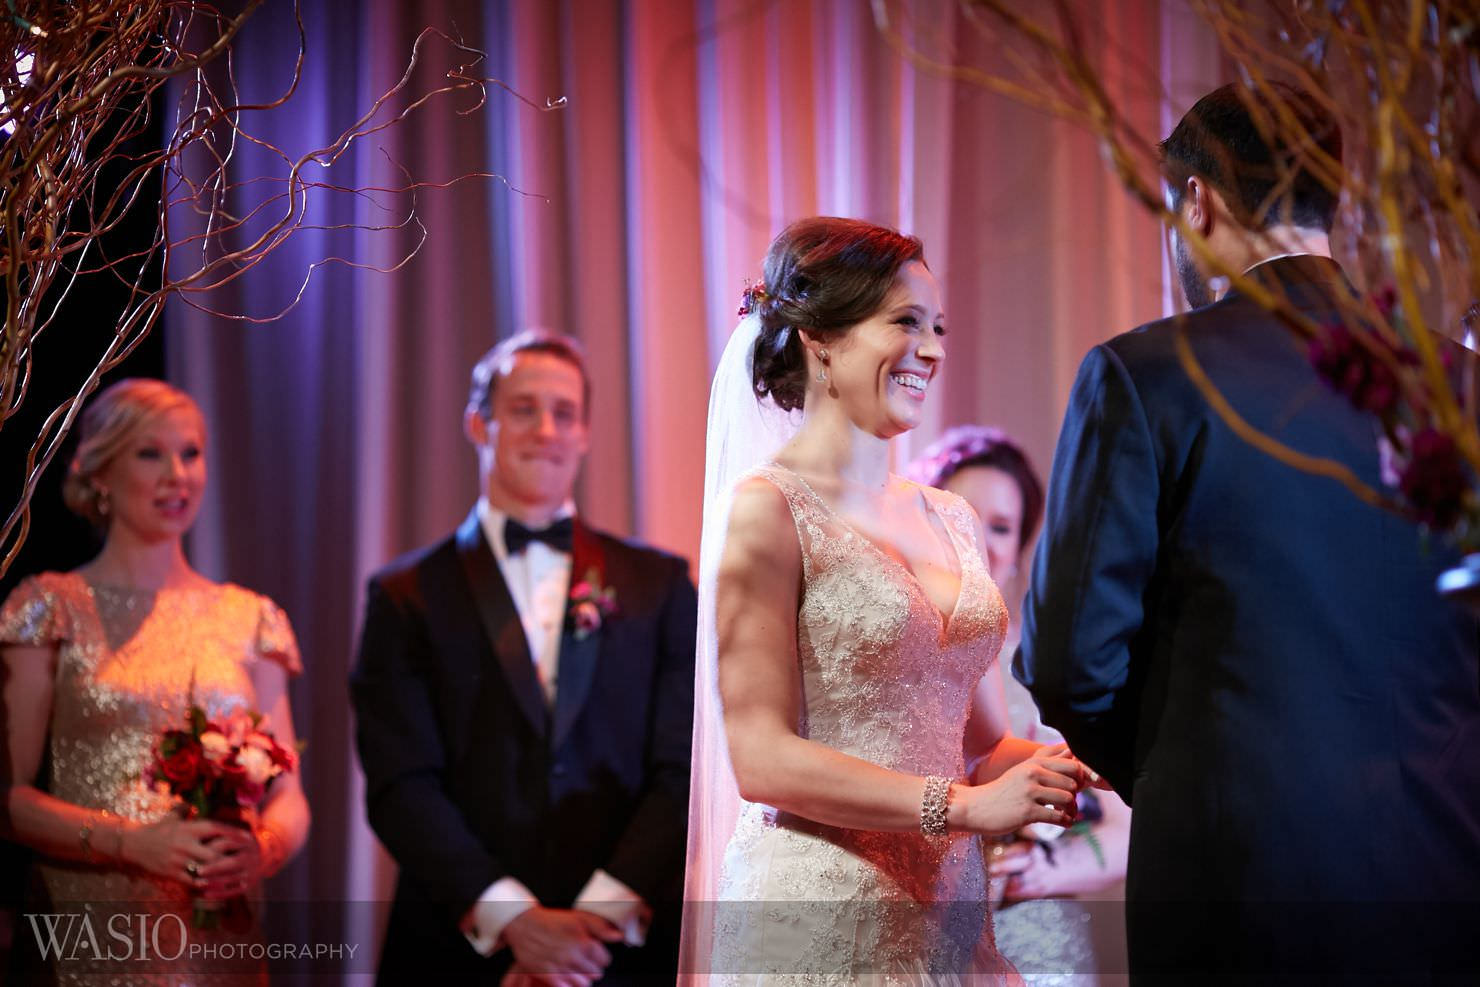 026_Lincoln-Park-Wedding_Dimphy-Mark__O3A0154 Lincoln Park Wedding - Dimphy & Mark